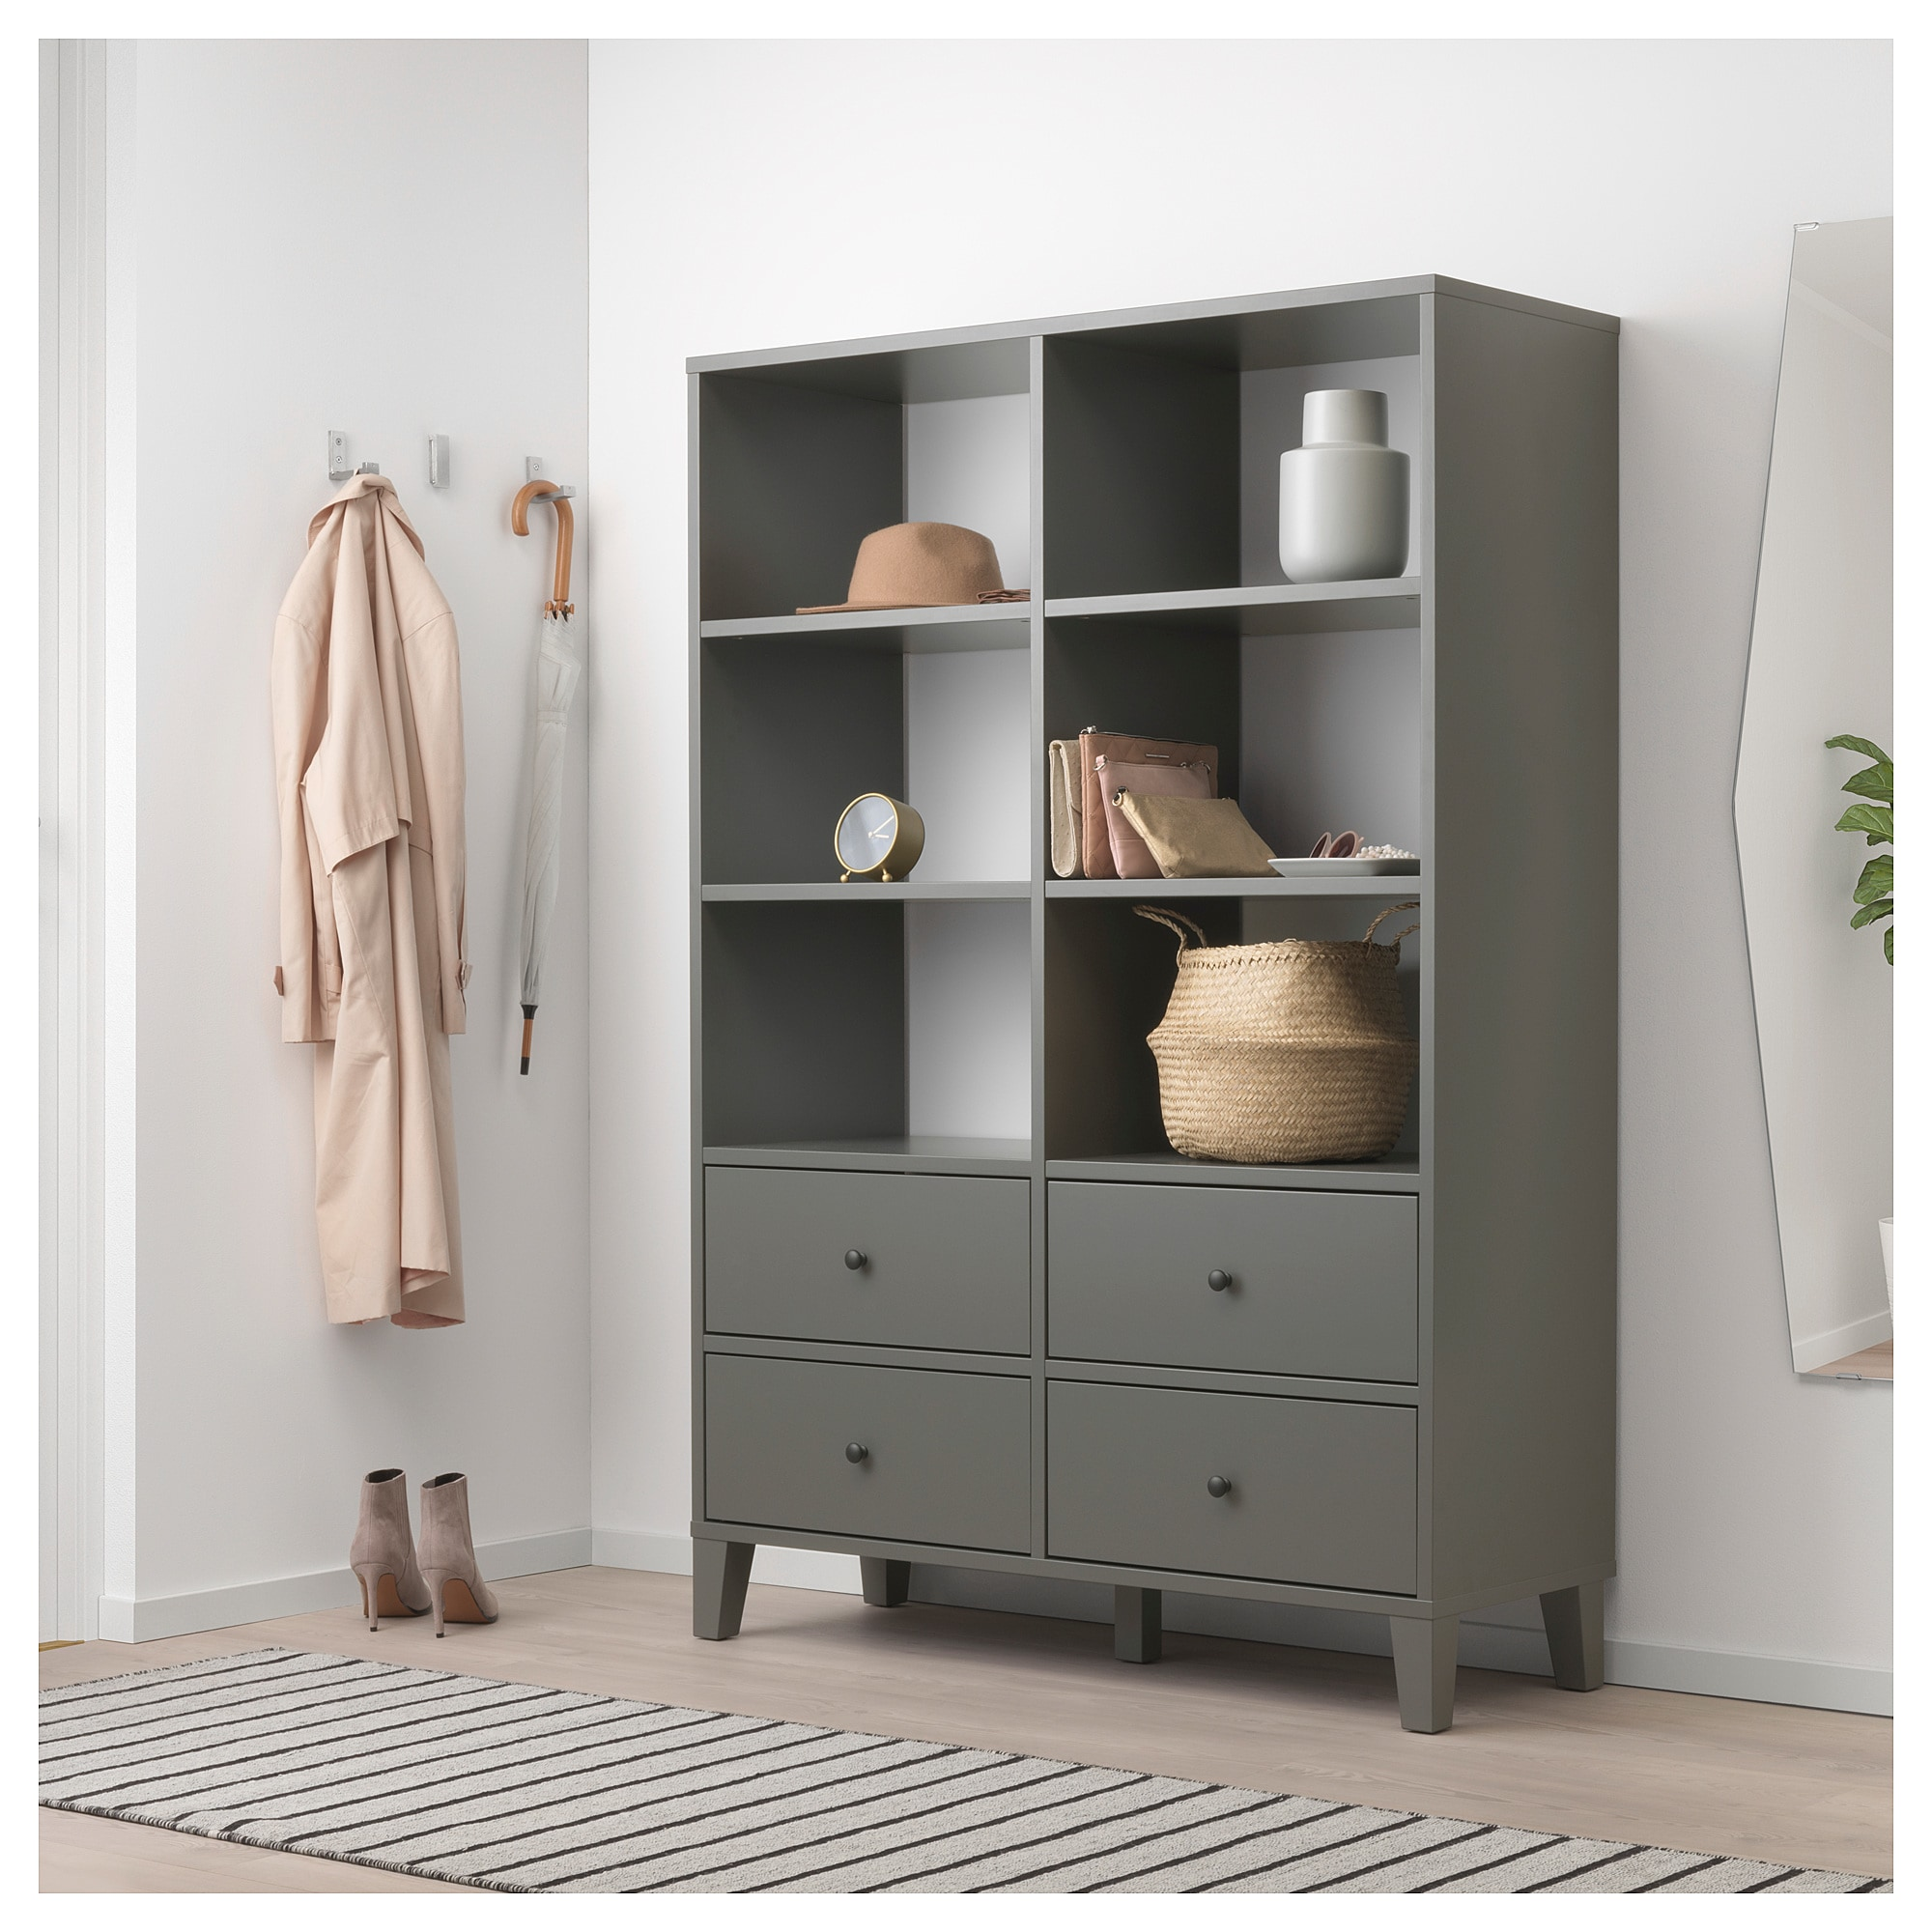 Bryggja Storage Unit Dark Gray 47 1 4x68 1 8 Bedroom Storage For Small Rooms Apartment Storage Storage Solutions Bedroom